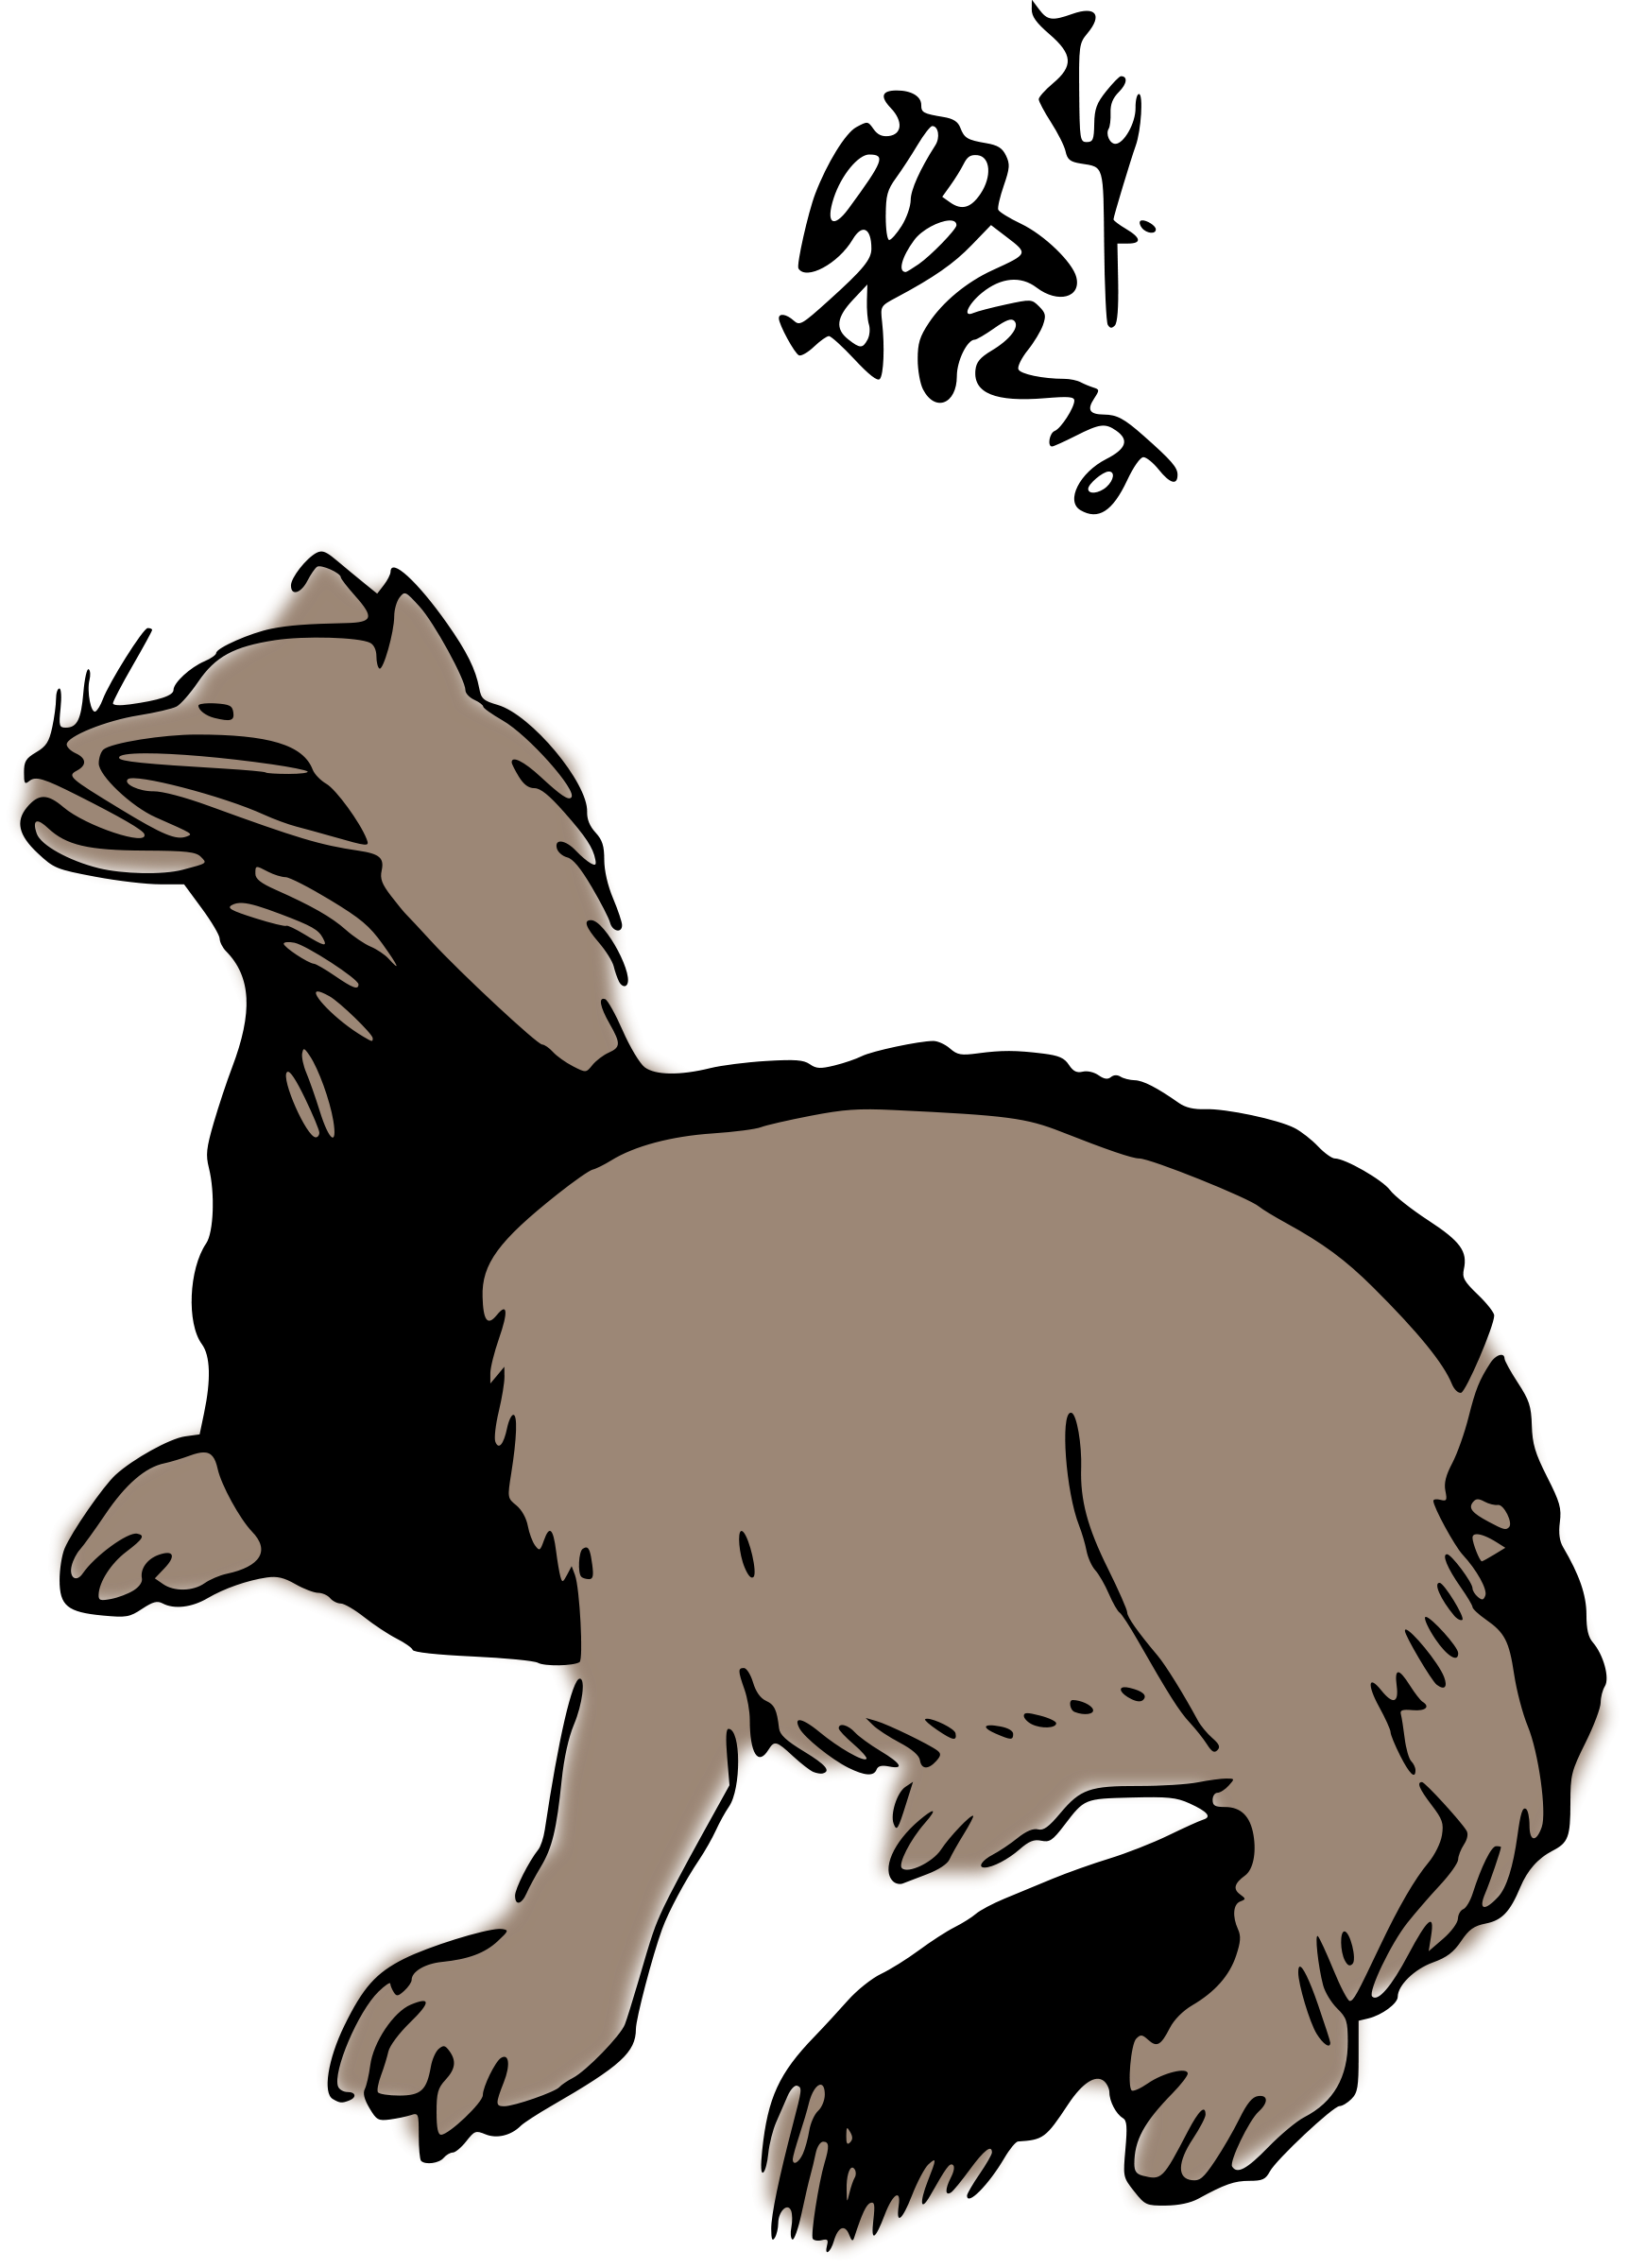 svg freeuse download Images panda free. Badger clipart clip art.